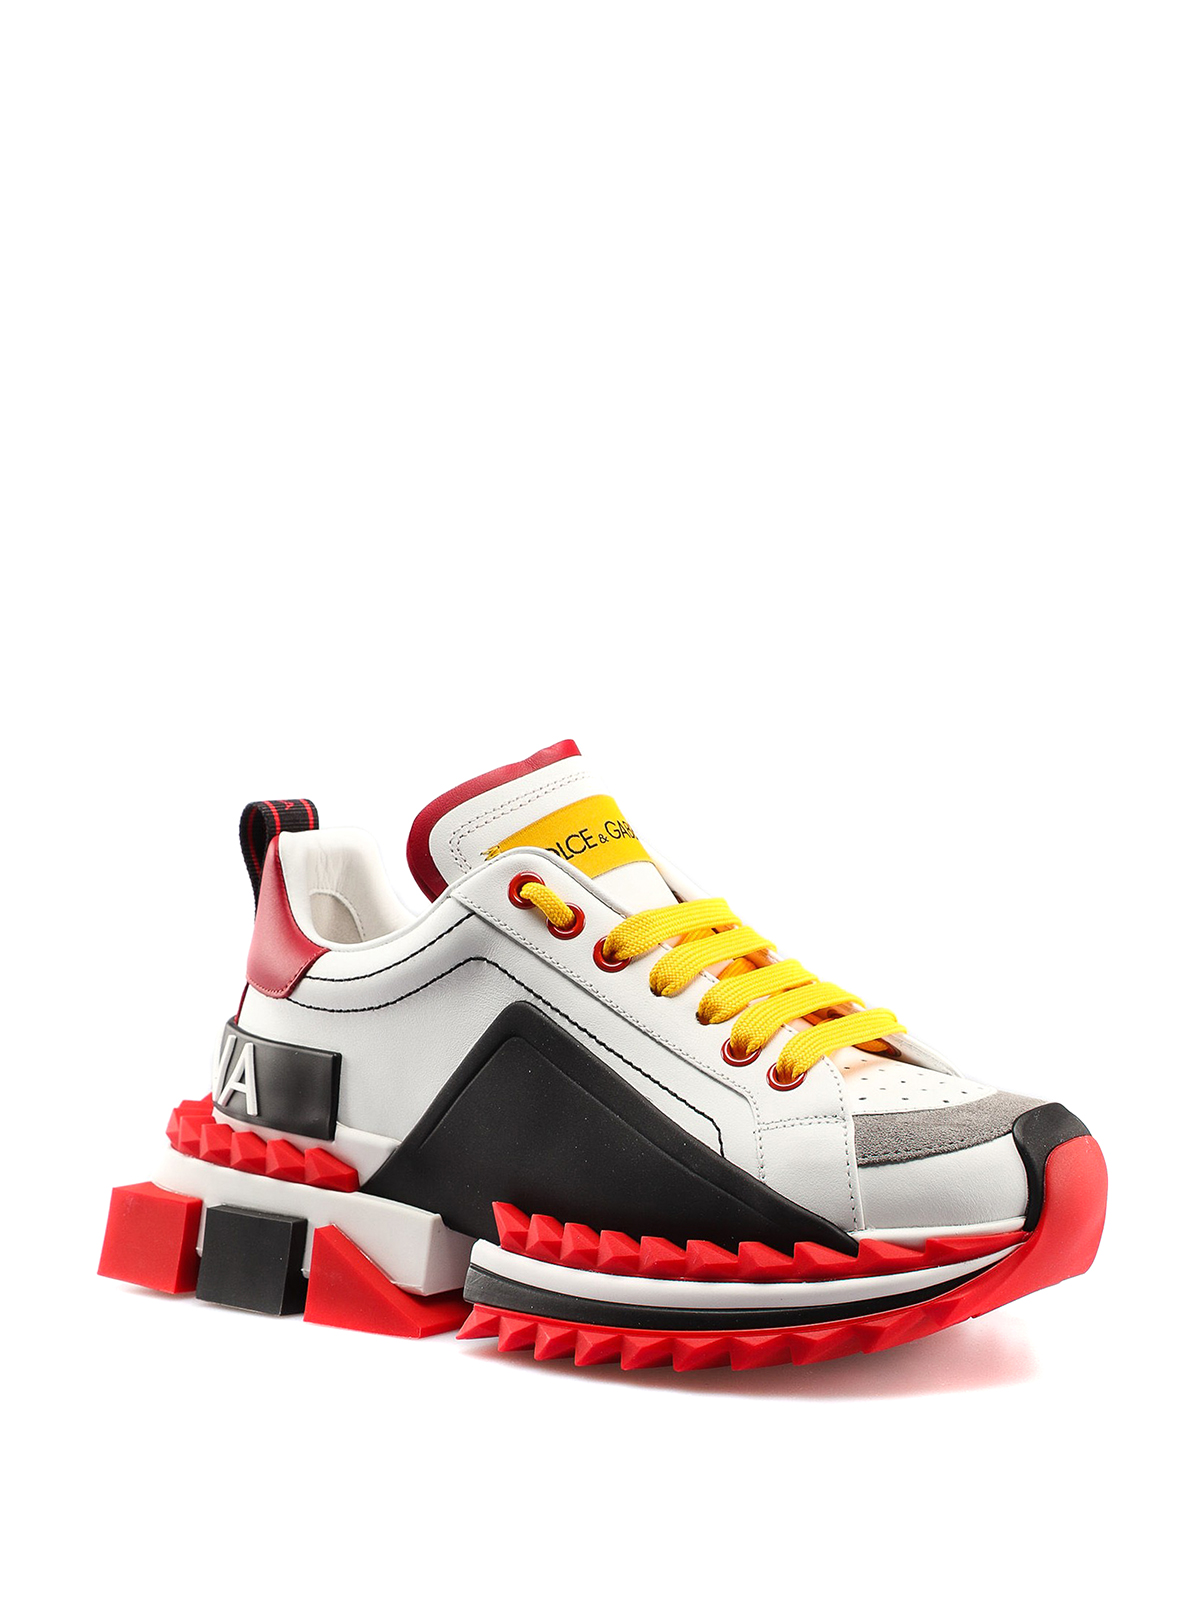 Super Queen multicolour sneakers